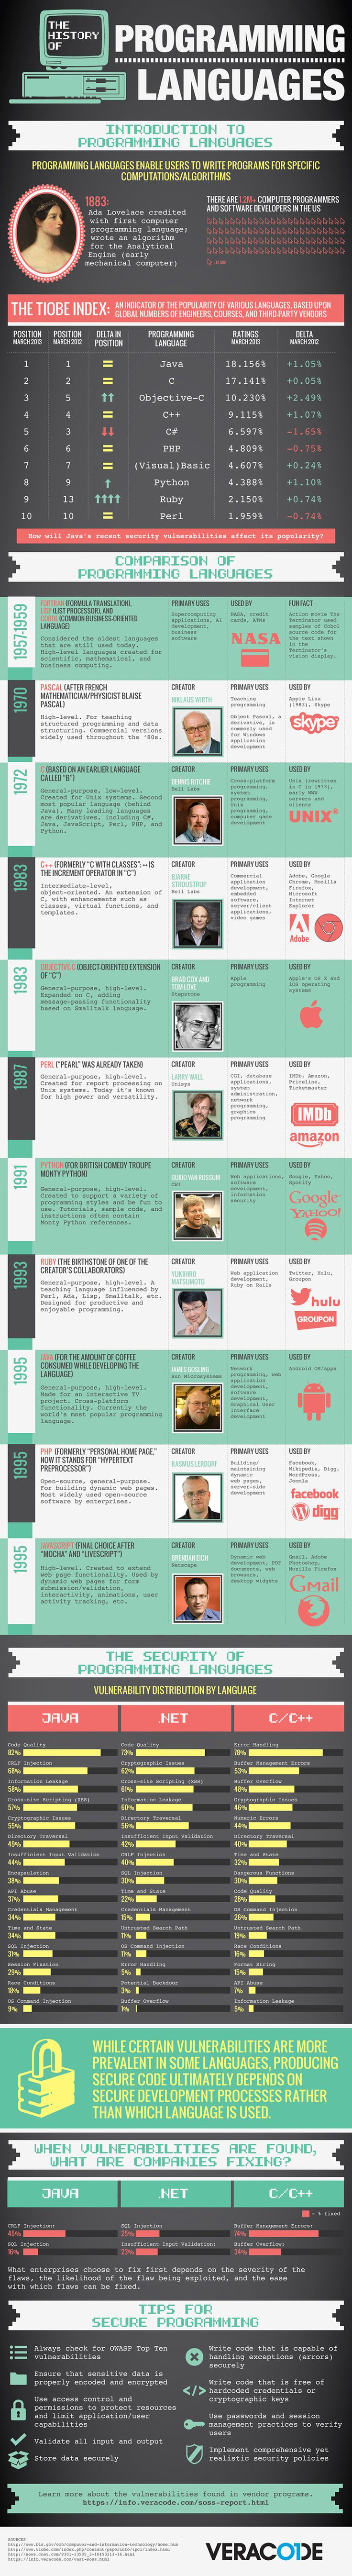 history-of-programming-languages-infographic #infogr8 #dataviz #infographic